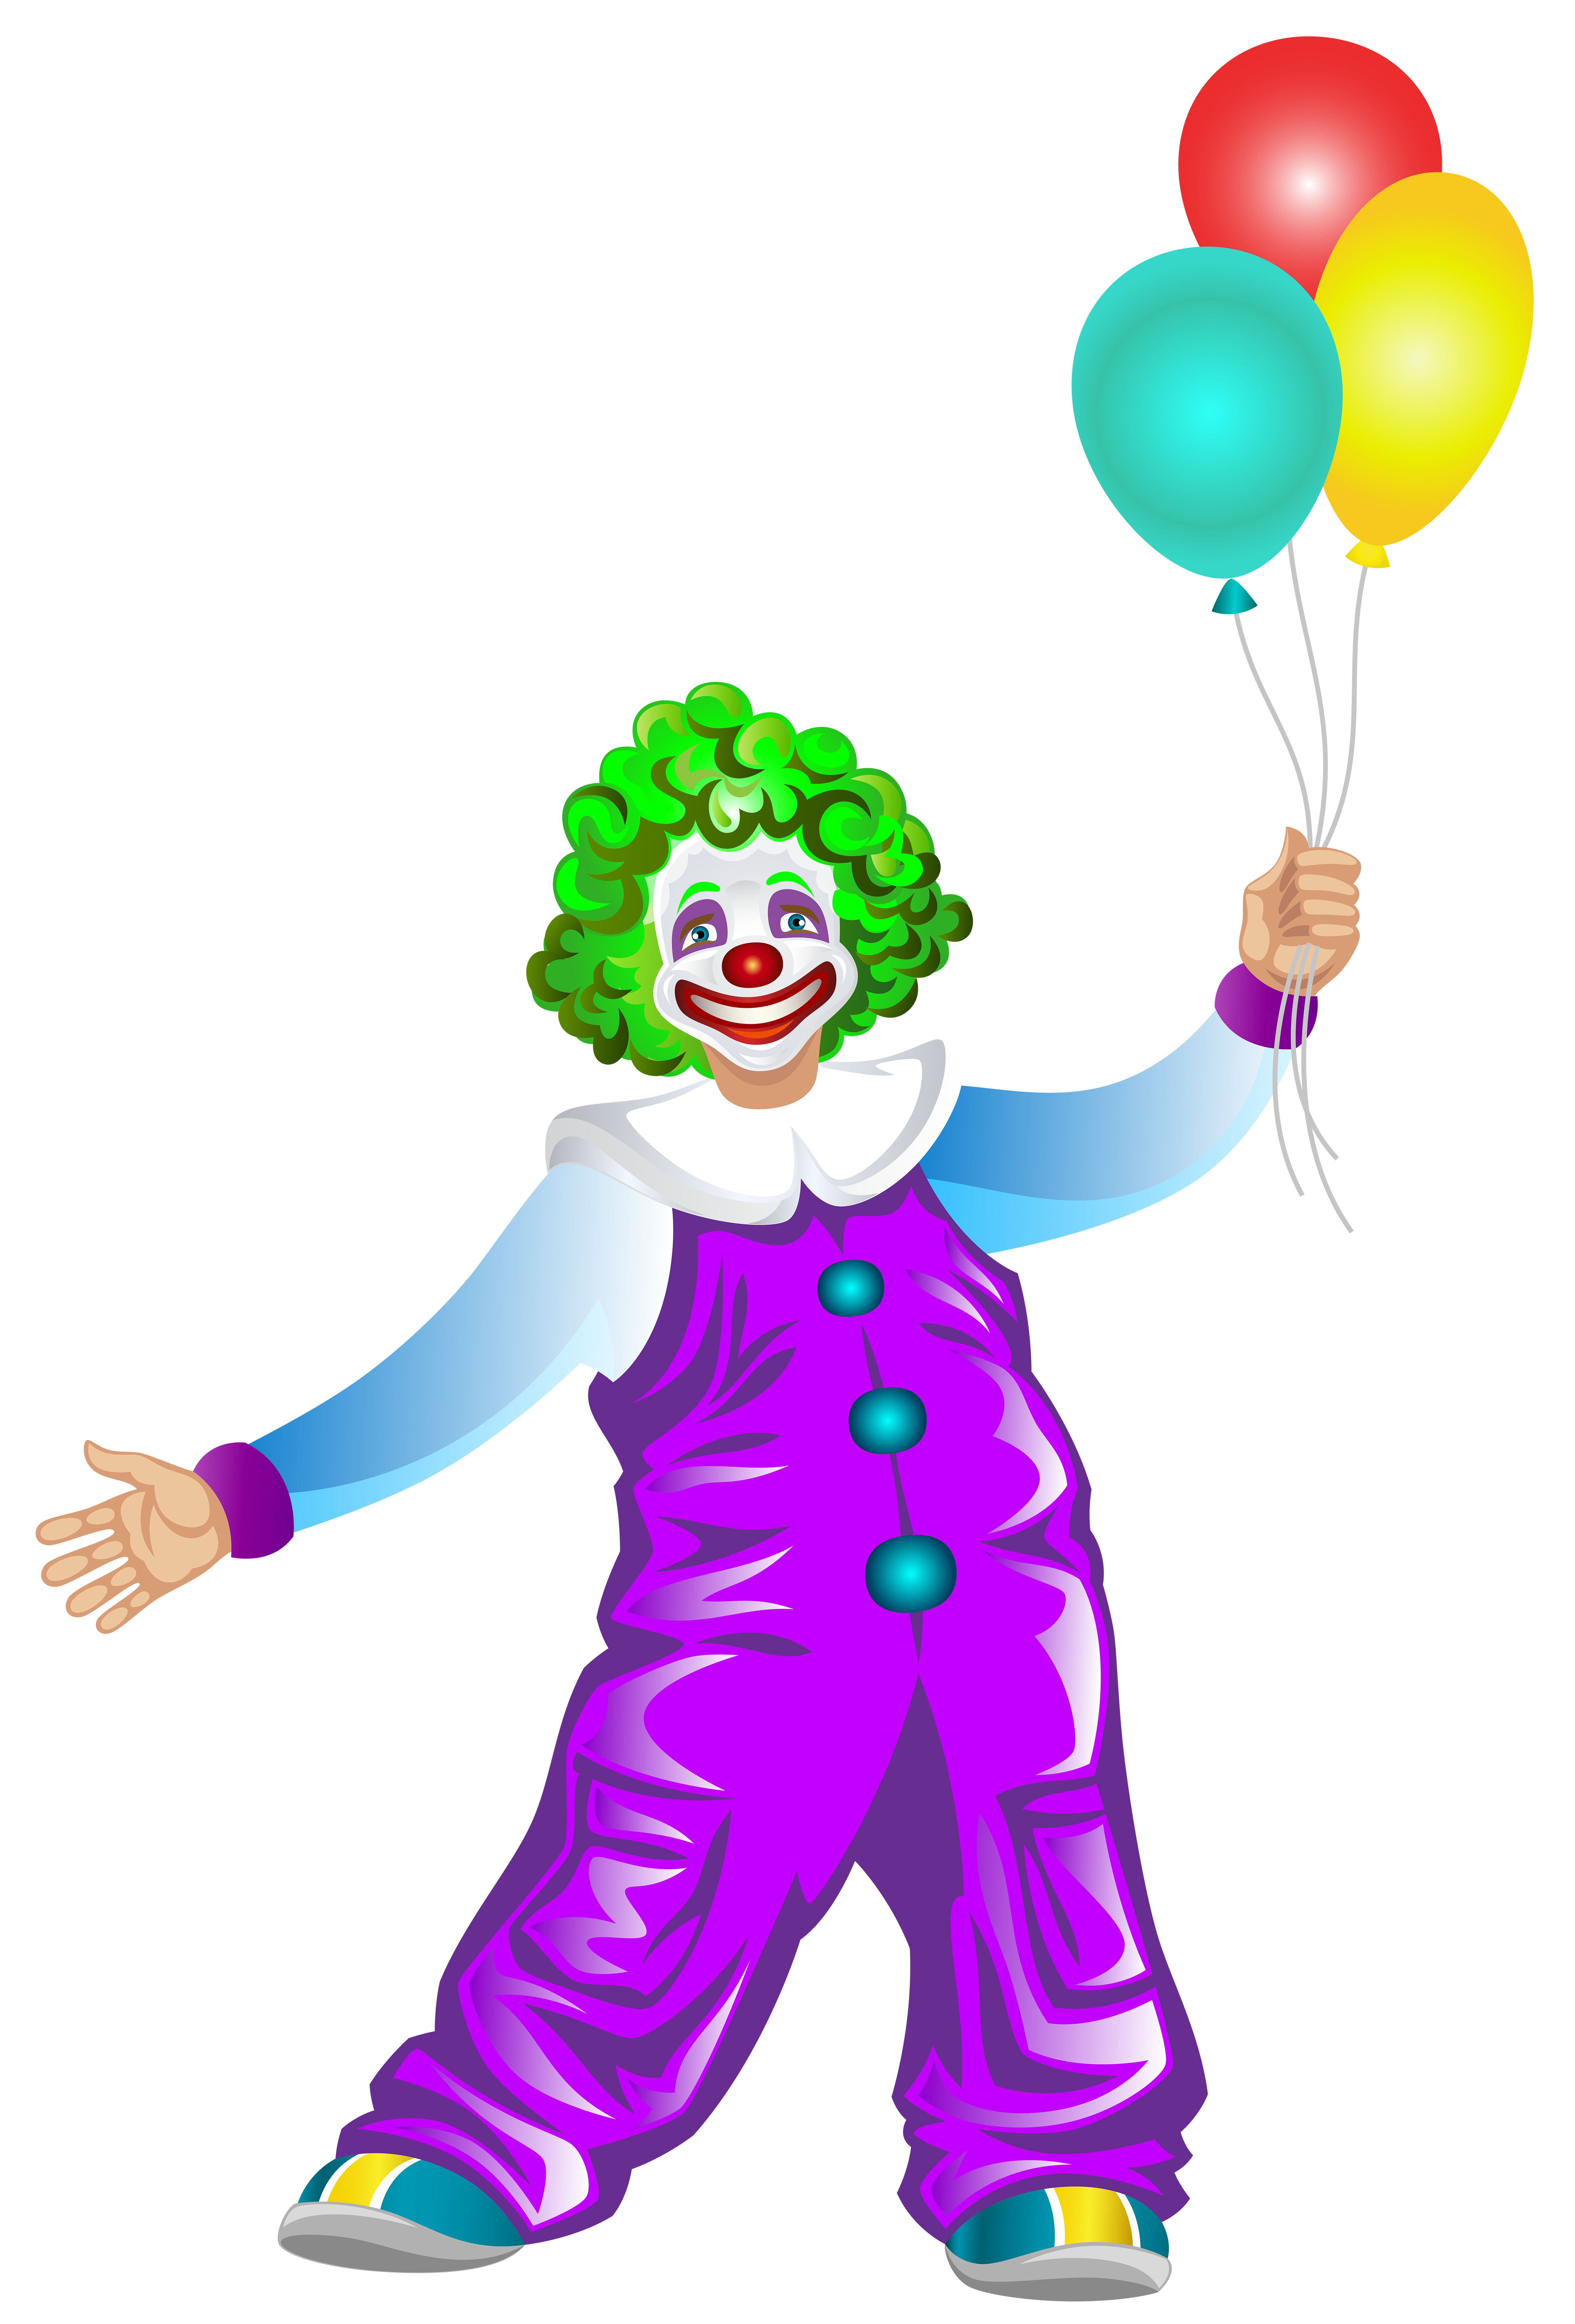 jpg library Png clip art image. Transparent 2ds clown